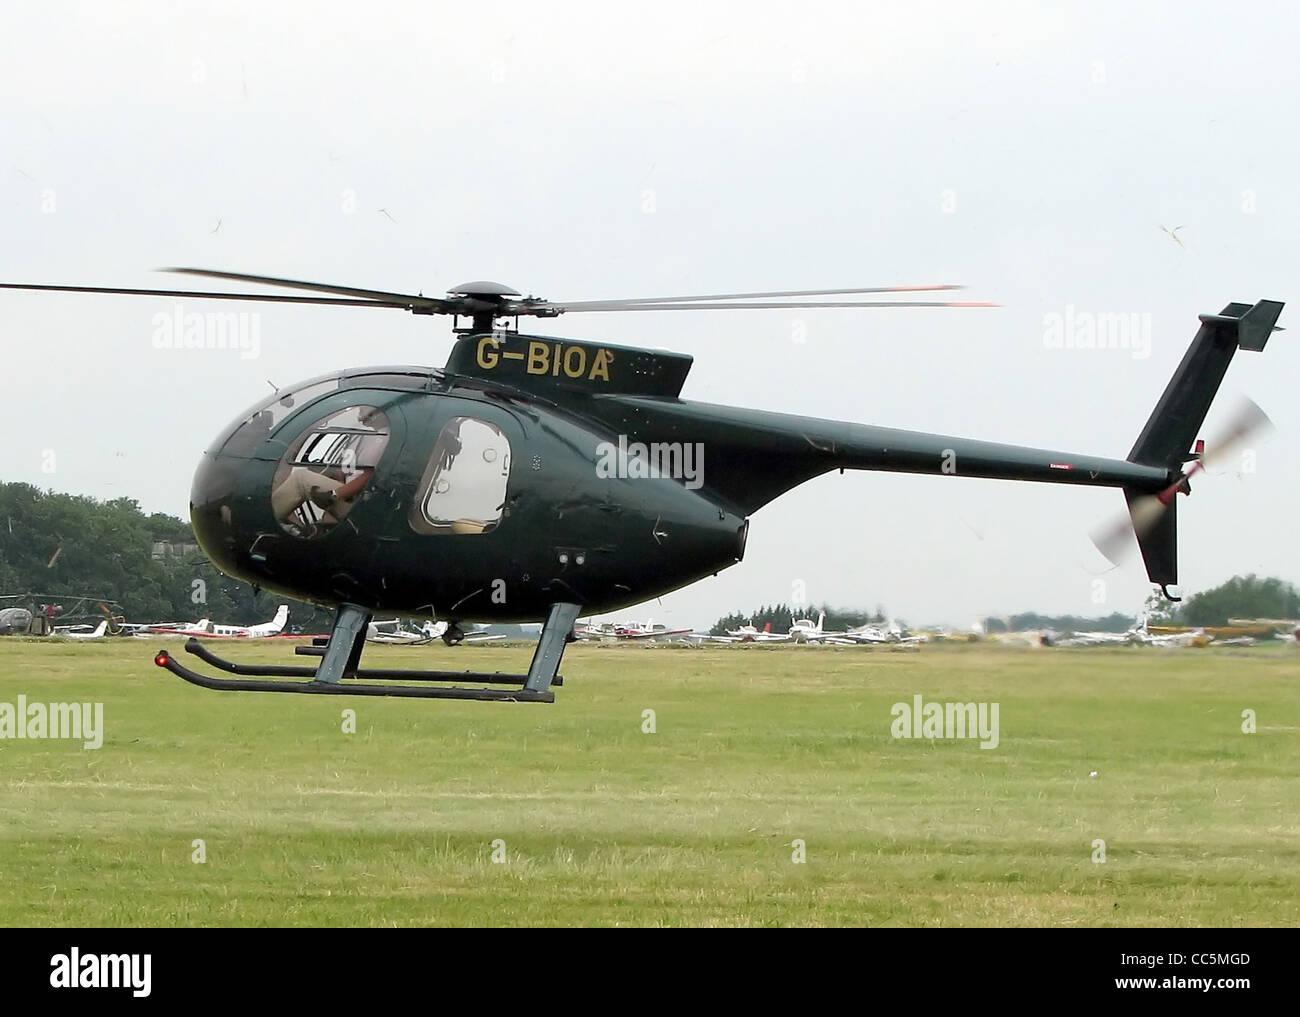 Hughes 500 Model 369D (G-BIOA, built 1980) at Kemble Airfield, Gloucestershire, England. - Stock Image